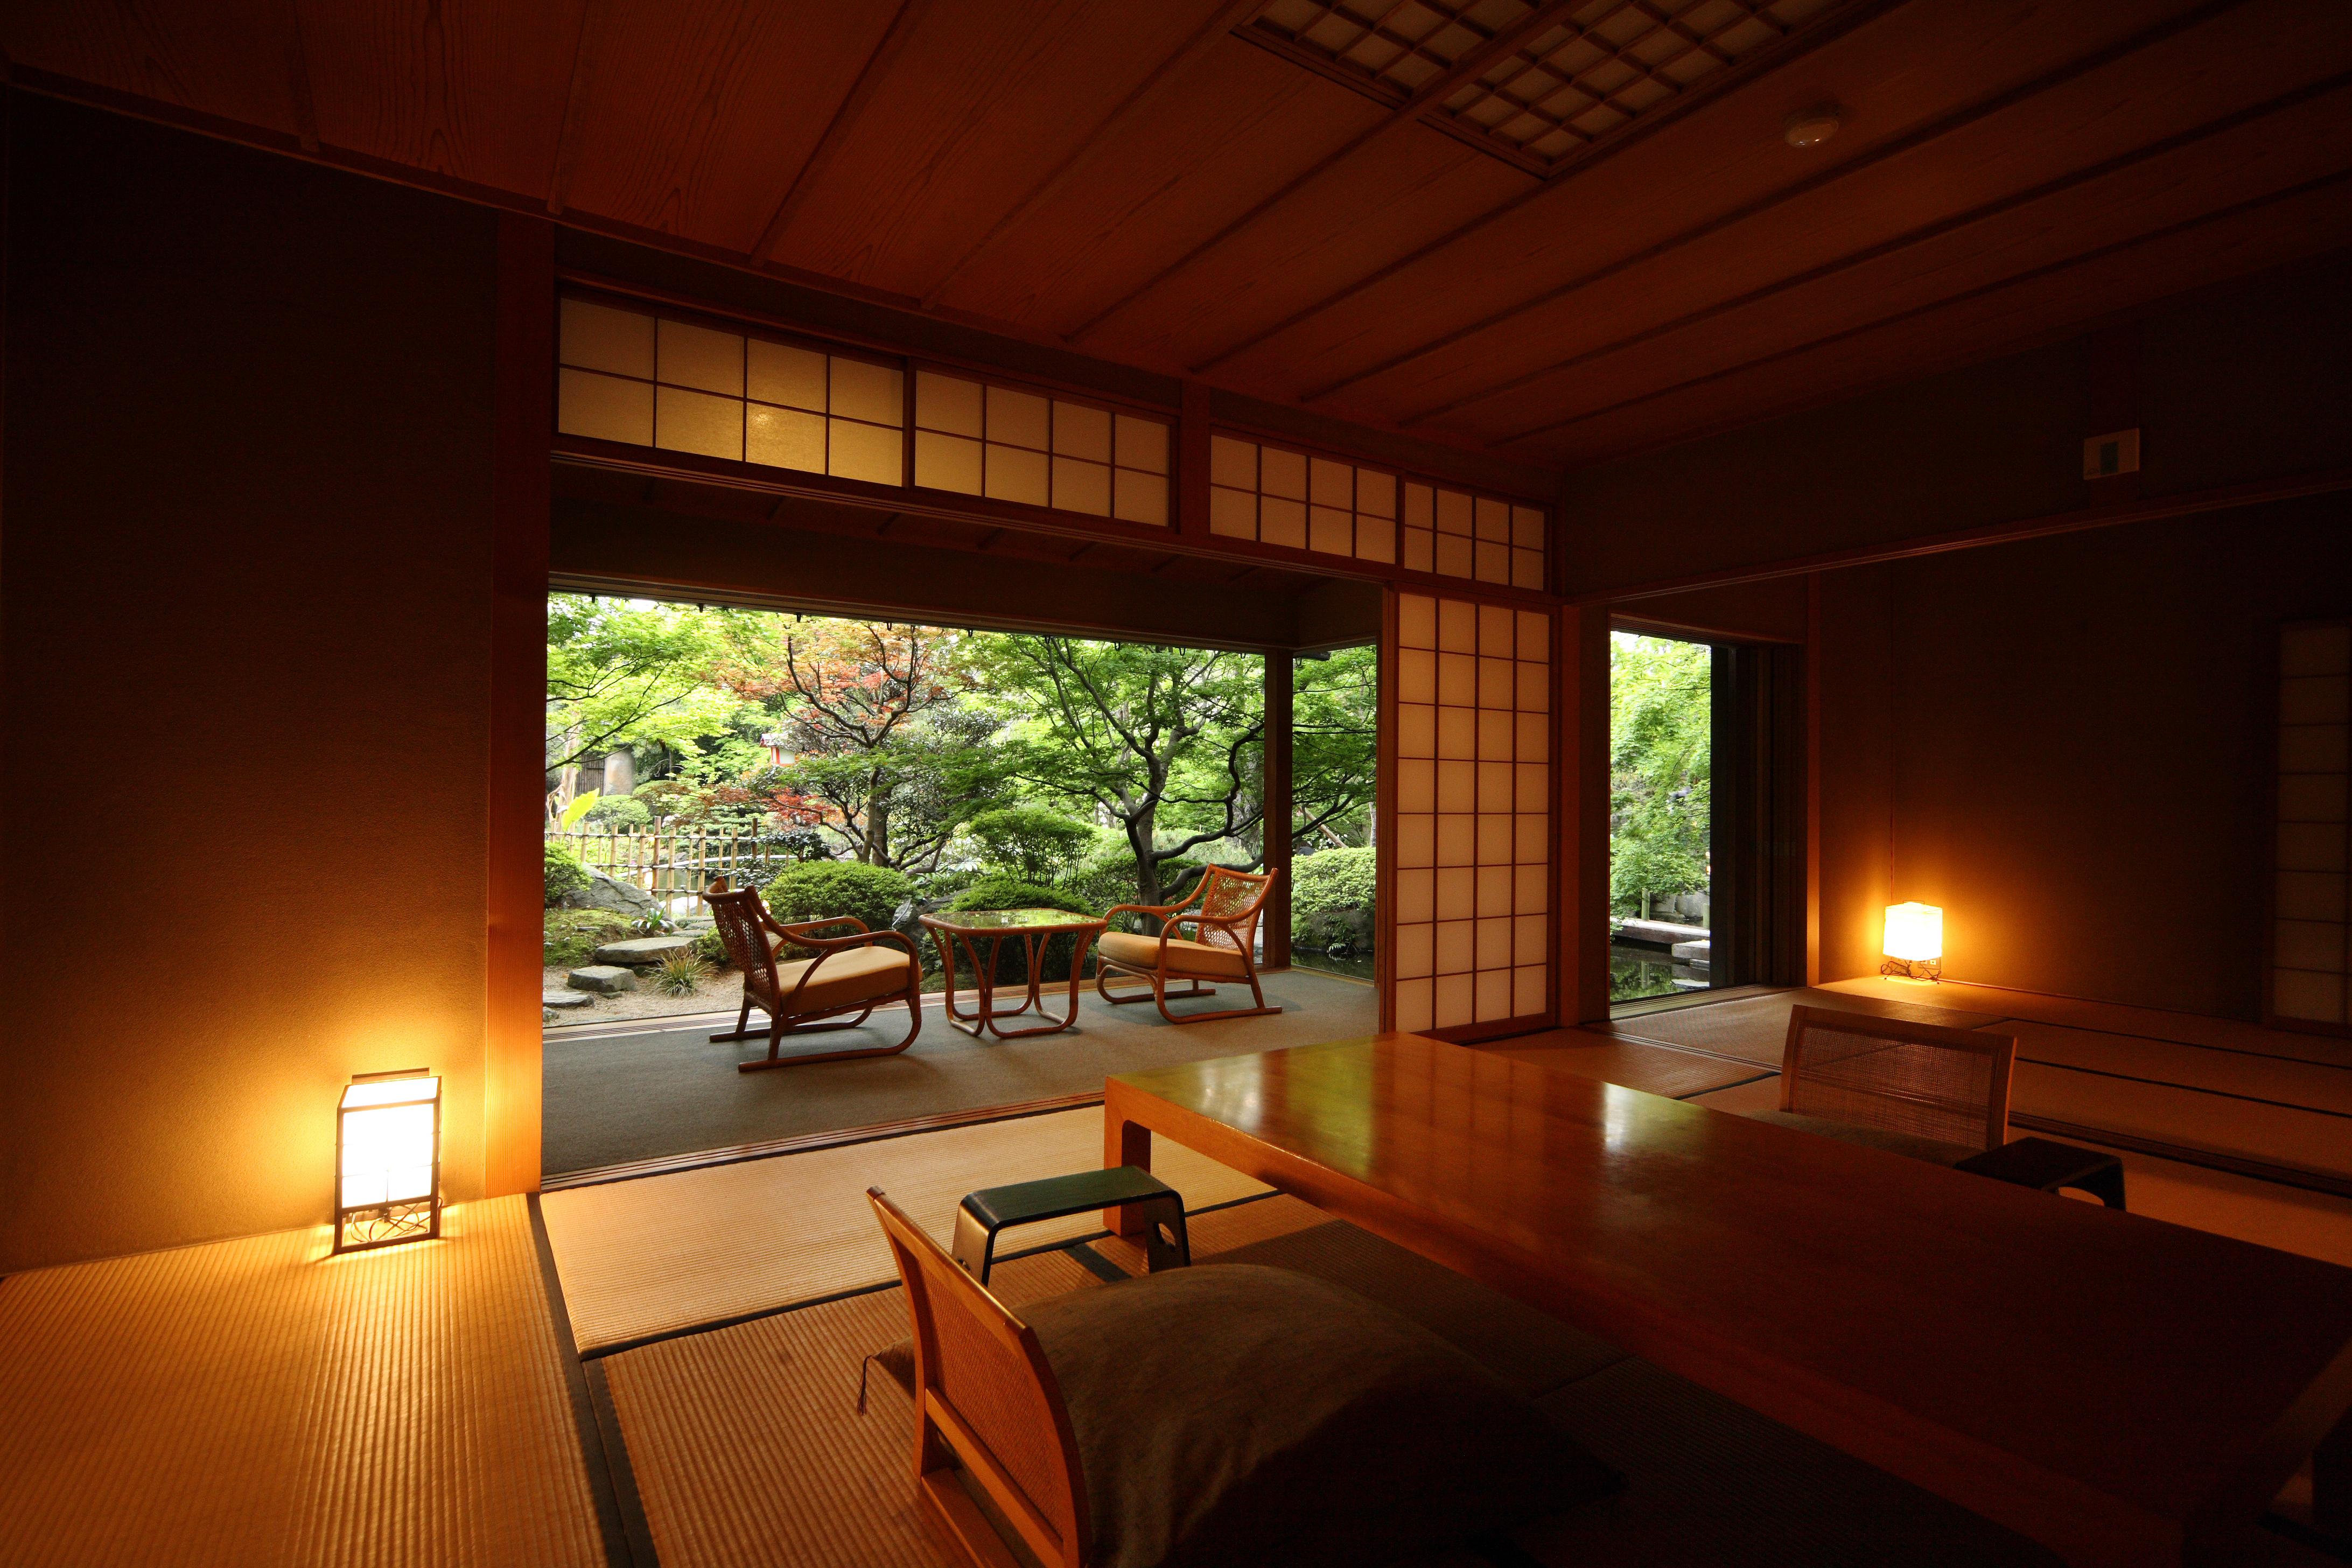 http://hotel-sys.tabirai.net/img/photo/fukuoka/24030.JPG